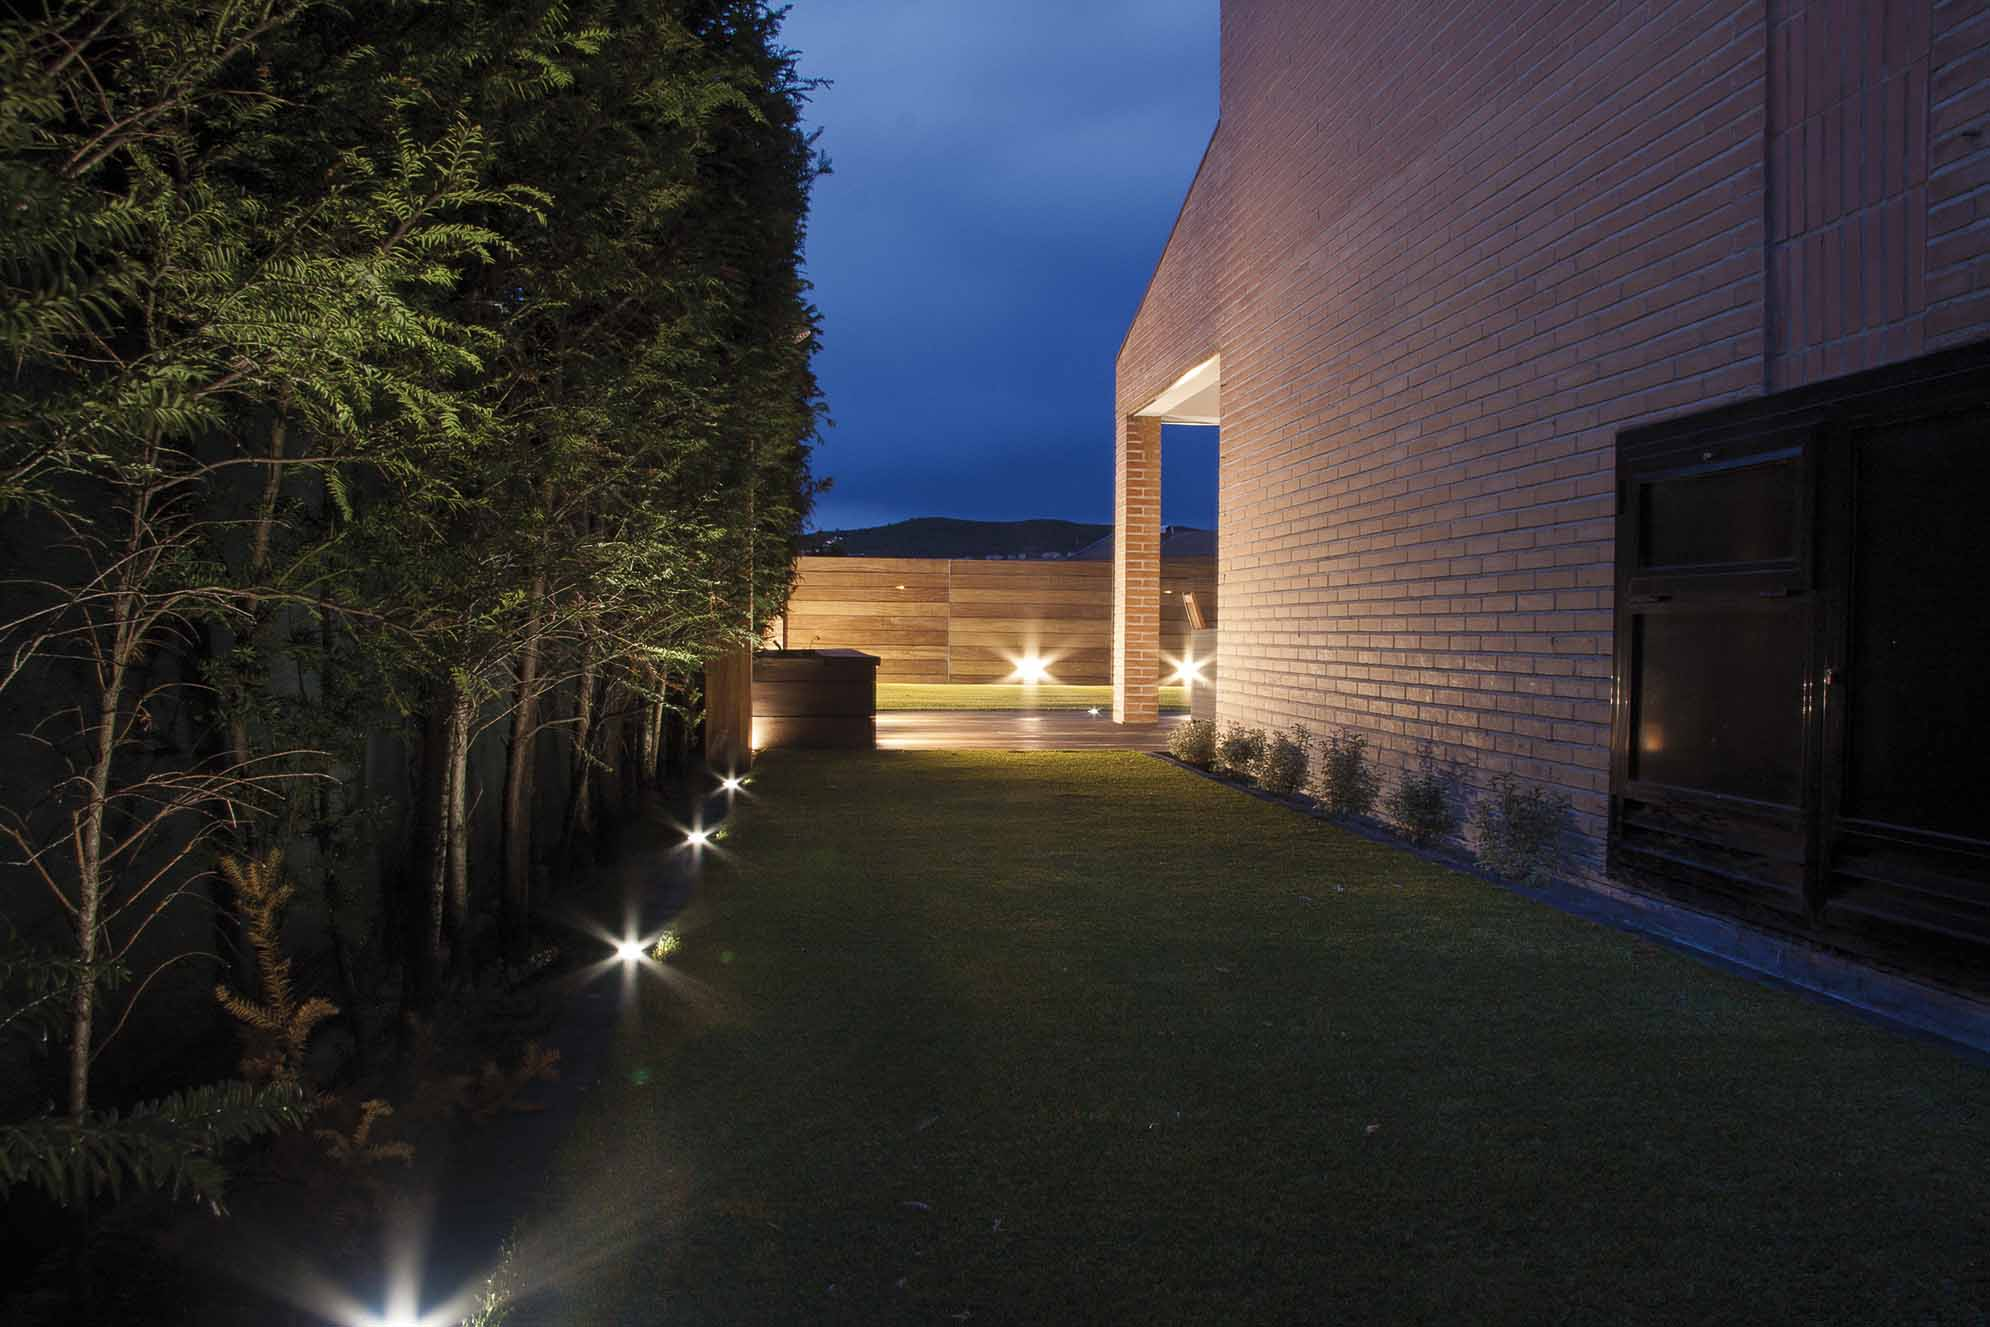 Iluminaci n proyectos echarri - Iluminacion jardines pequenos ...